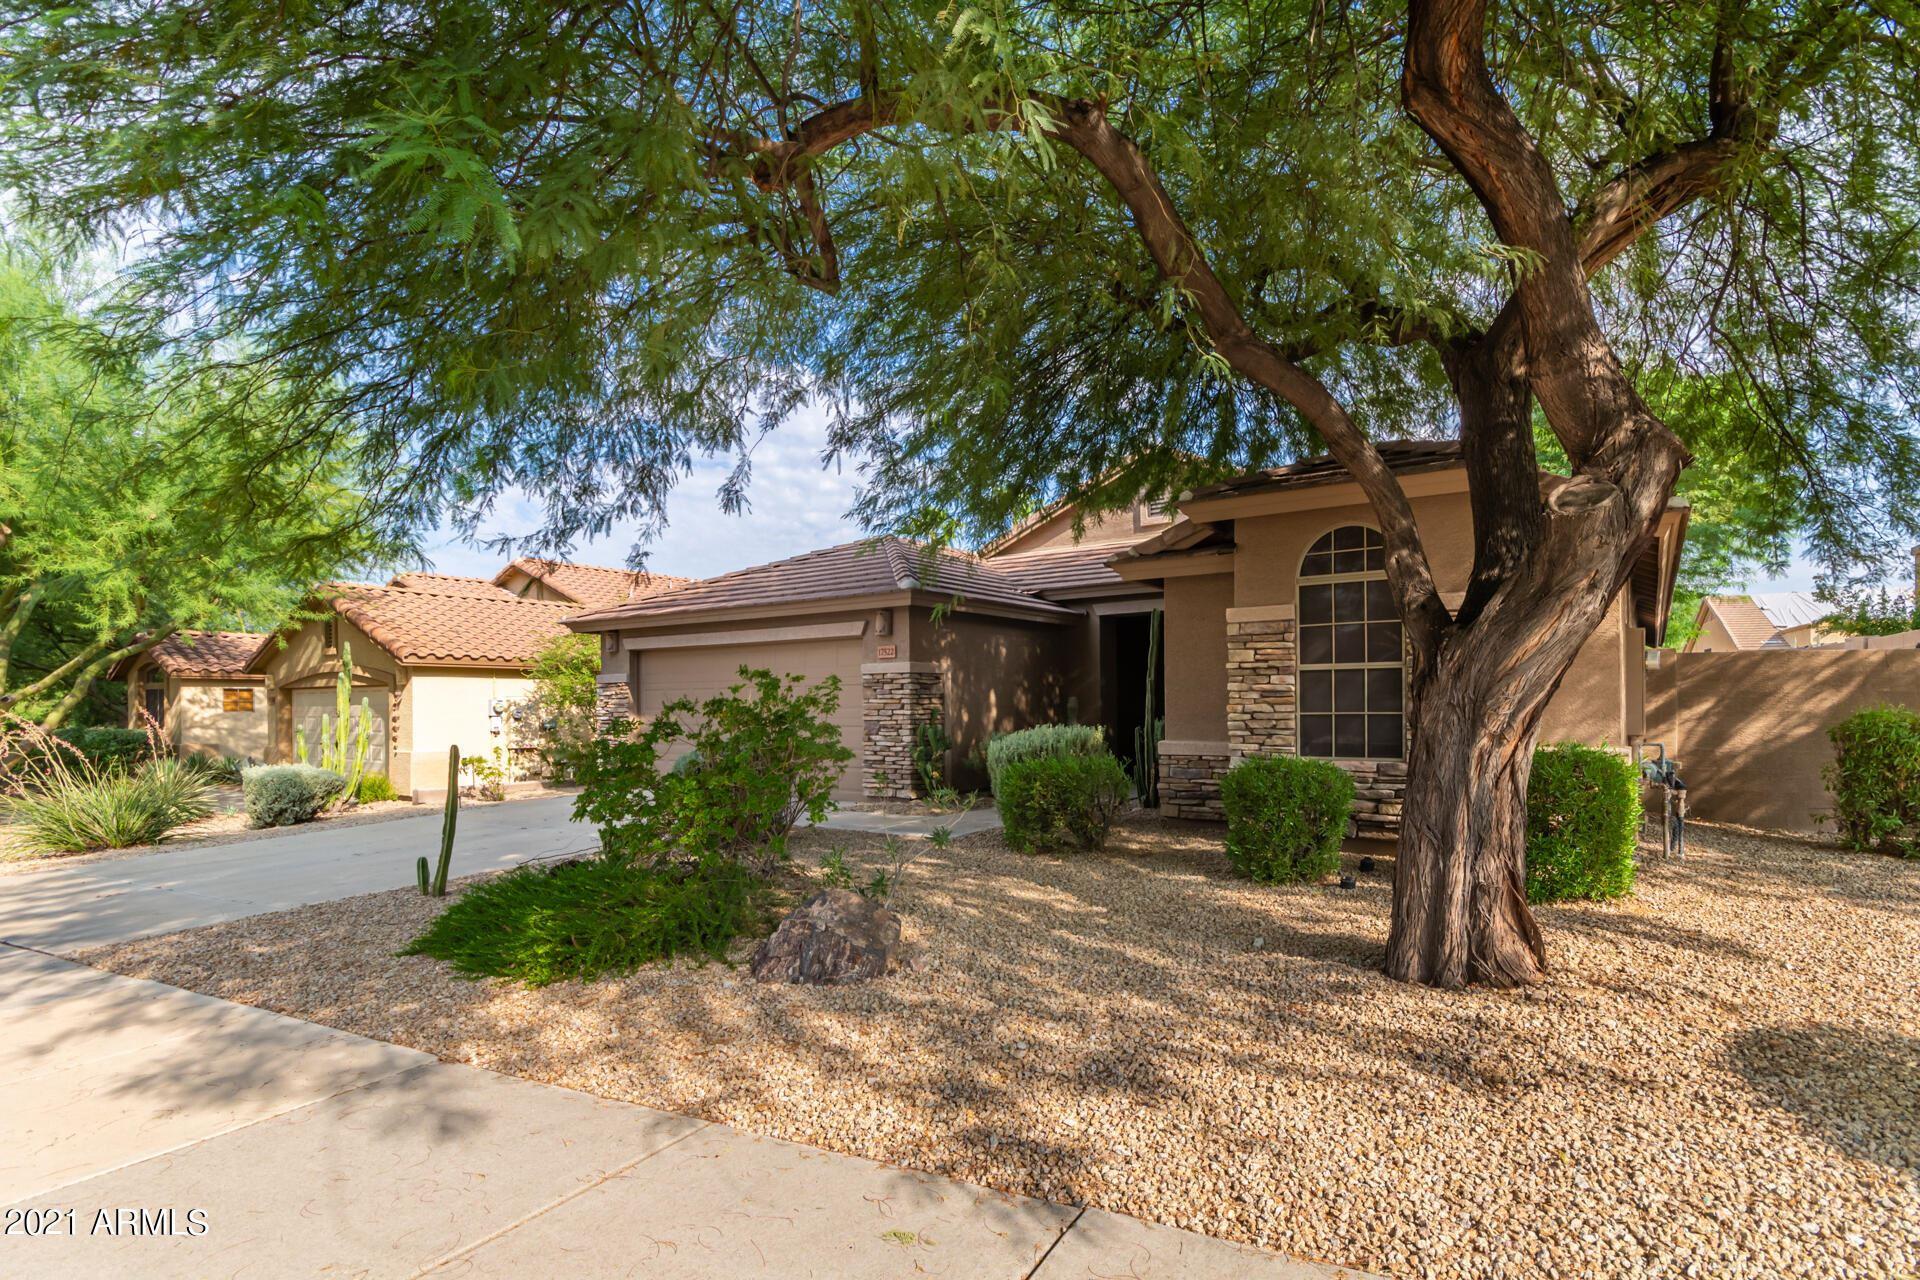 Photo of 17522 W WANDERING CREEK Road, Goodyear, AZ 85338 (MLS # 6295743)